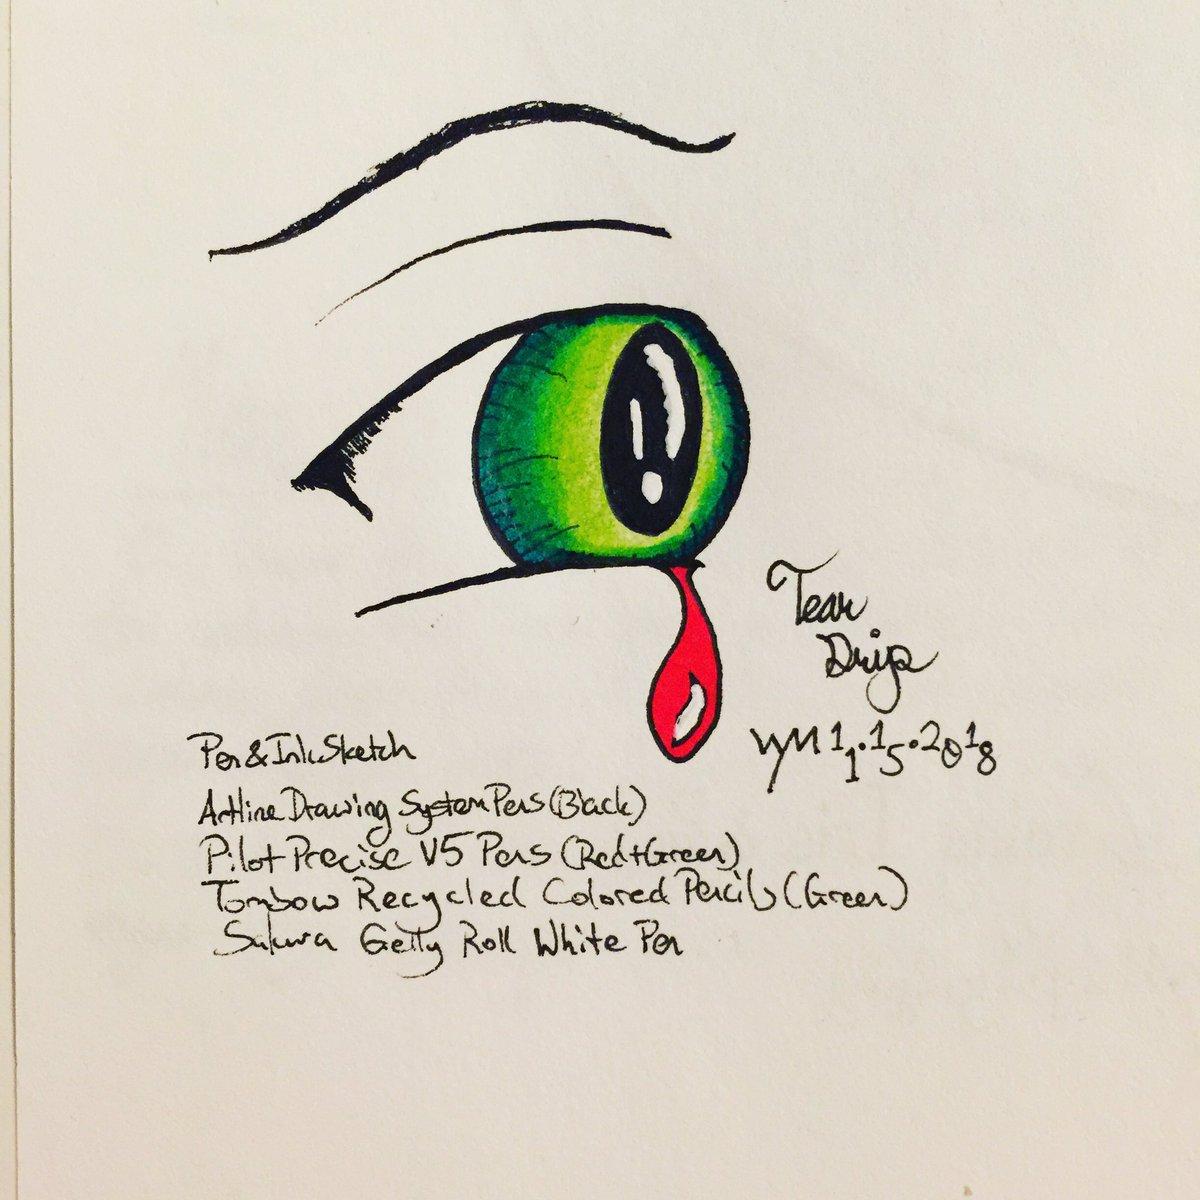 #wynart Tear Drip #teardrip #eye #crying #art #traditionalart #traditionalsketching #penandink #sketch #sketchingpic.twitter.com/4SDLGXSBeg